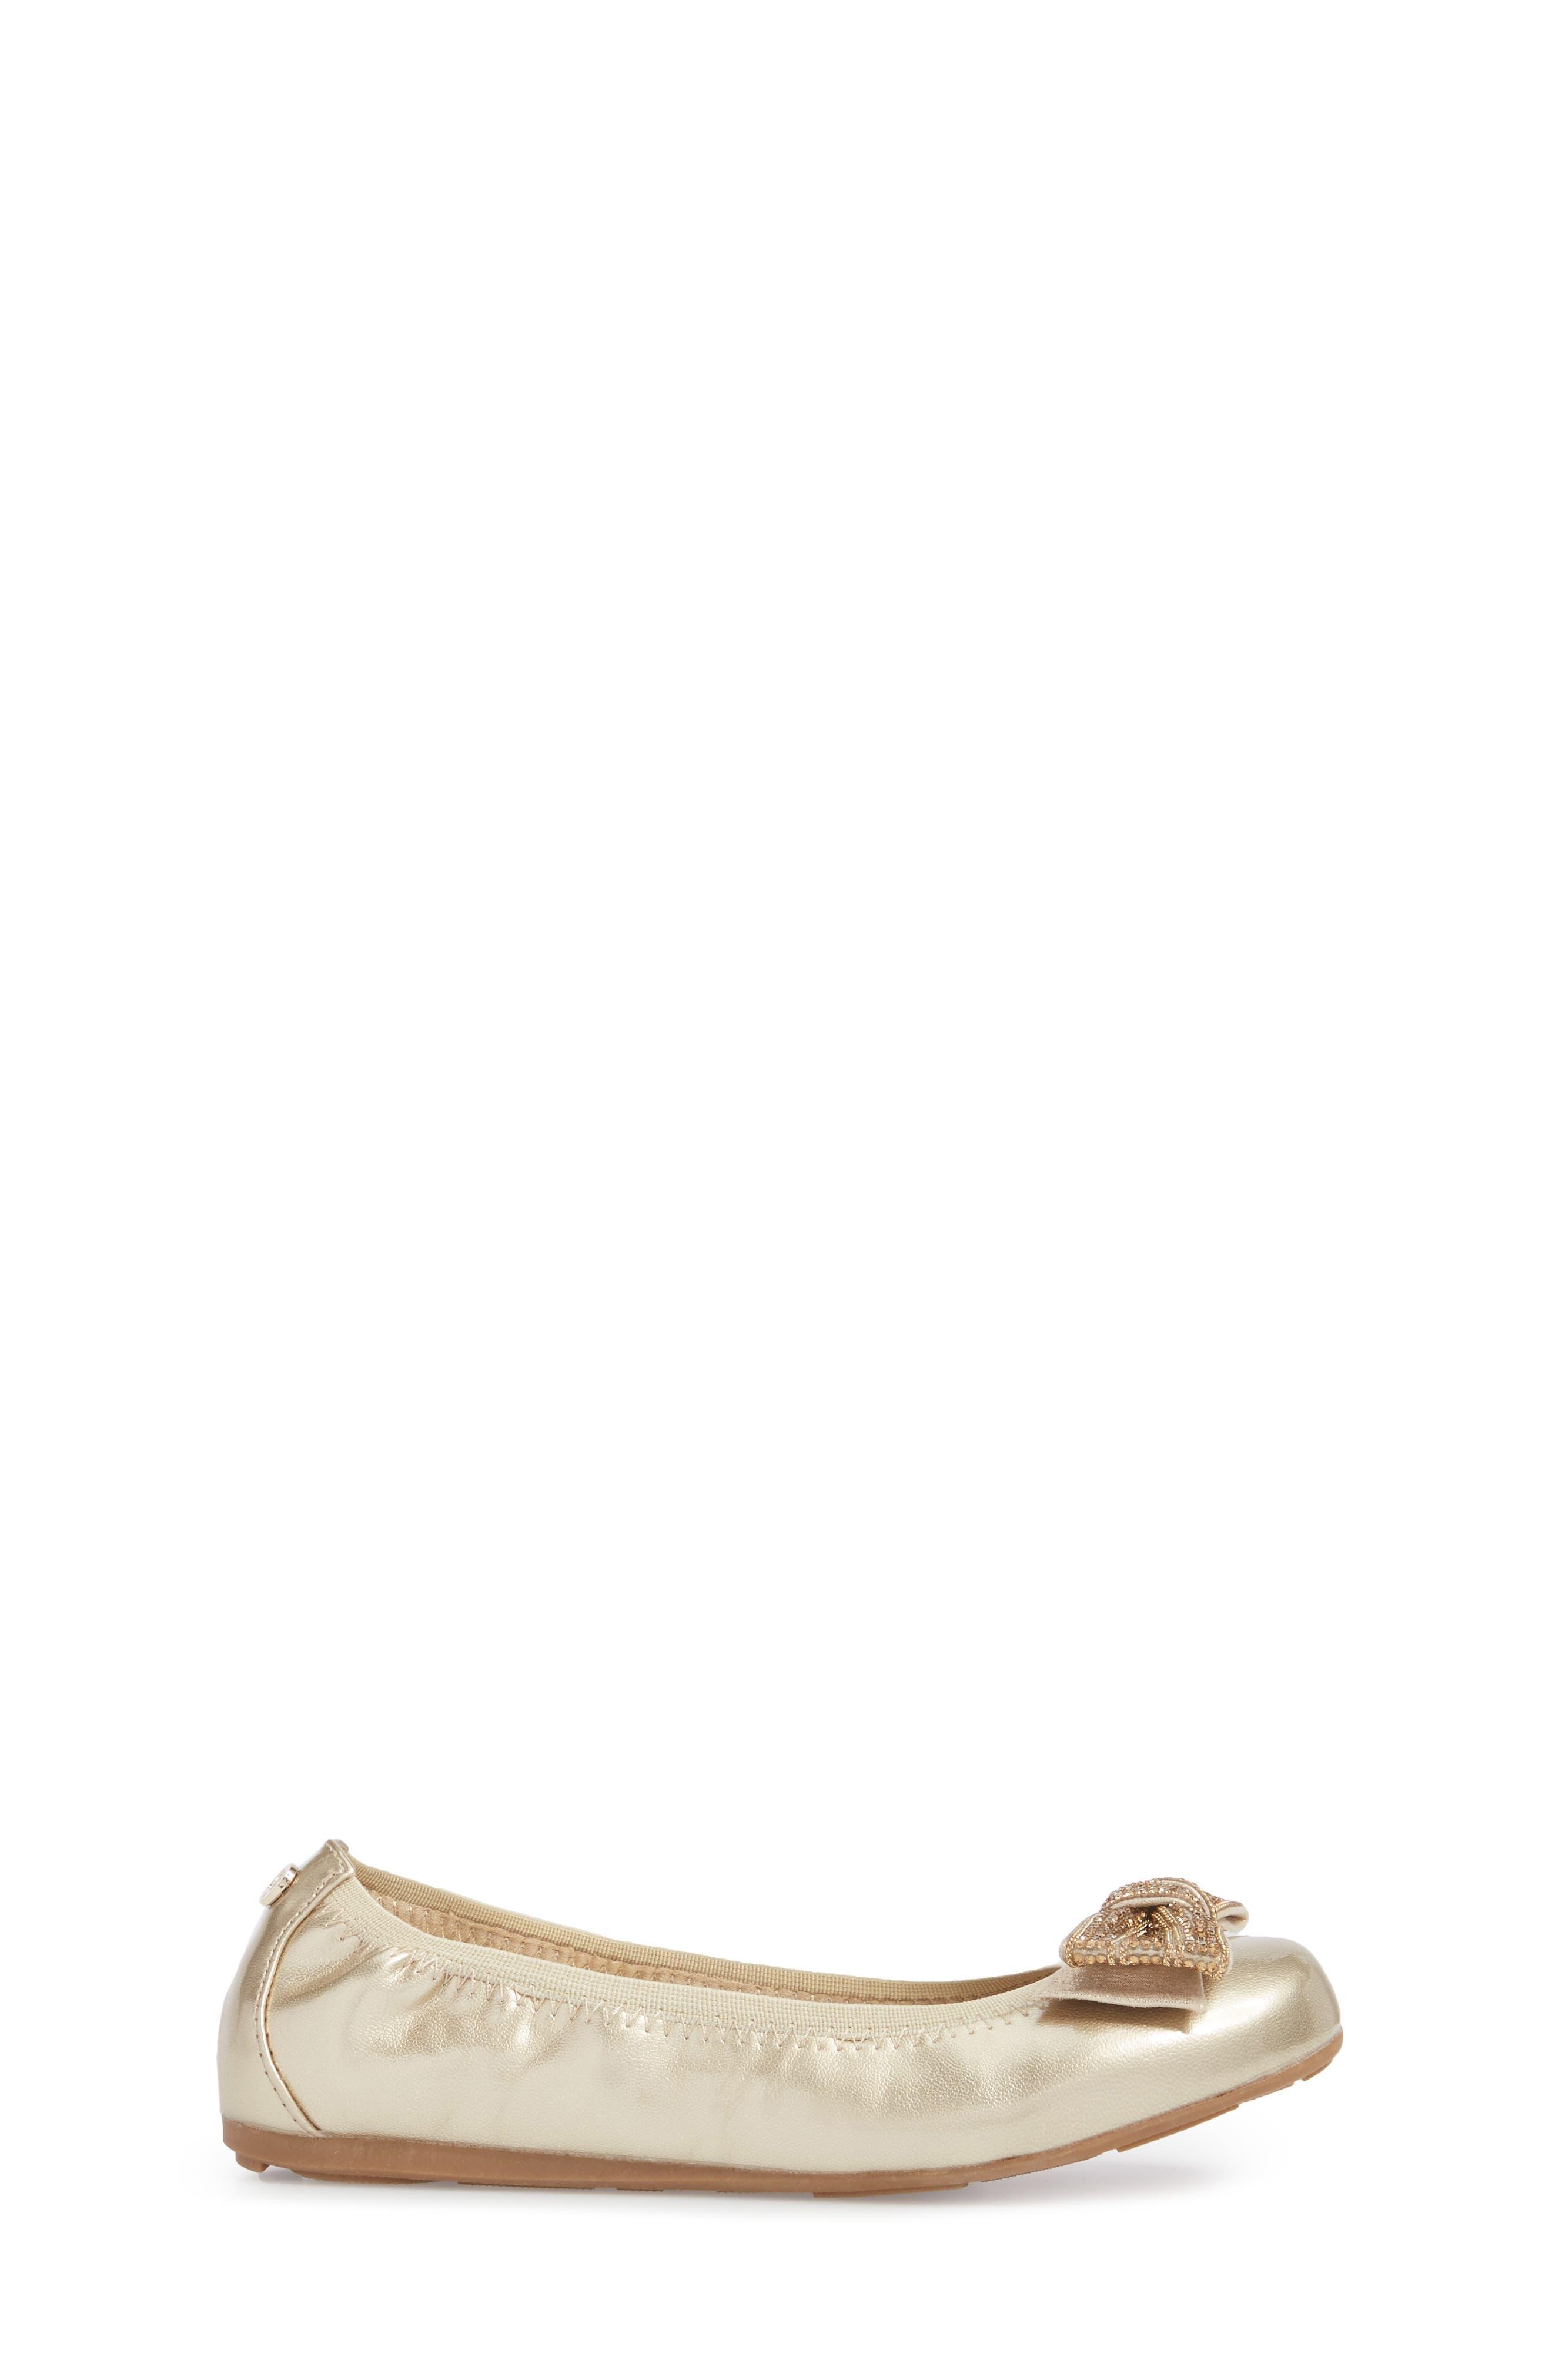 Fannie Embellished Bow Ballet Flat,                             Alternate thumbnail 9, color,